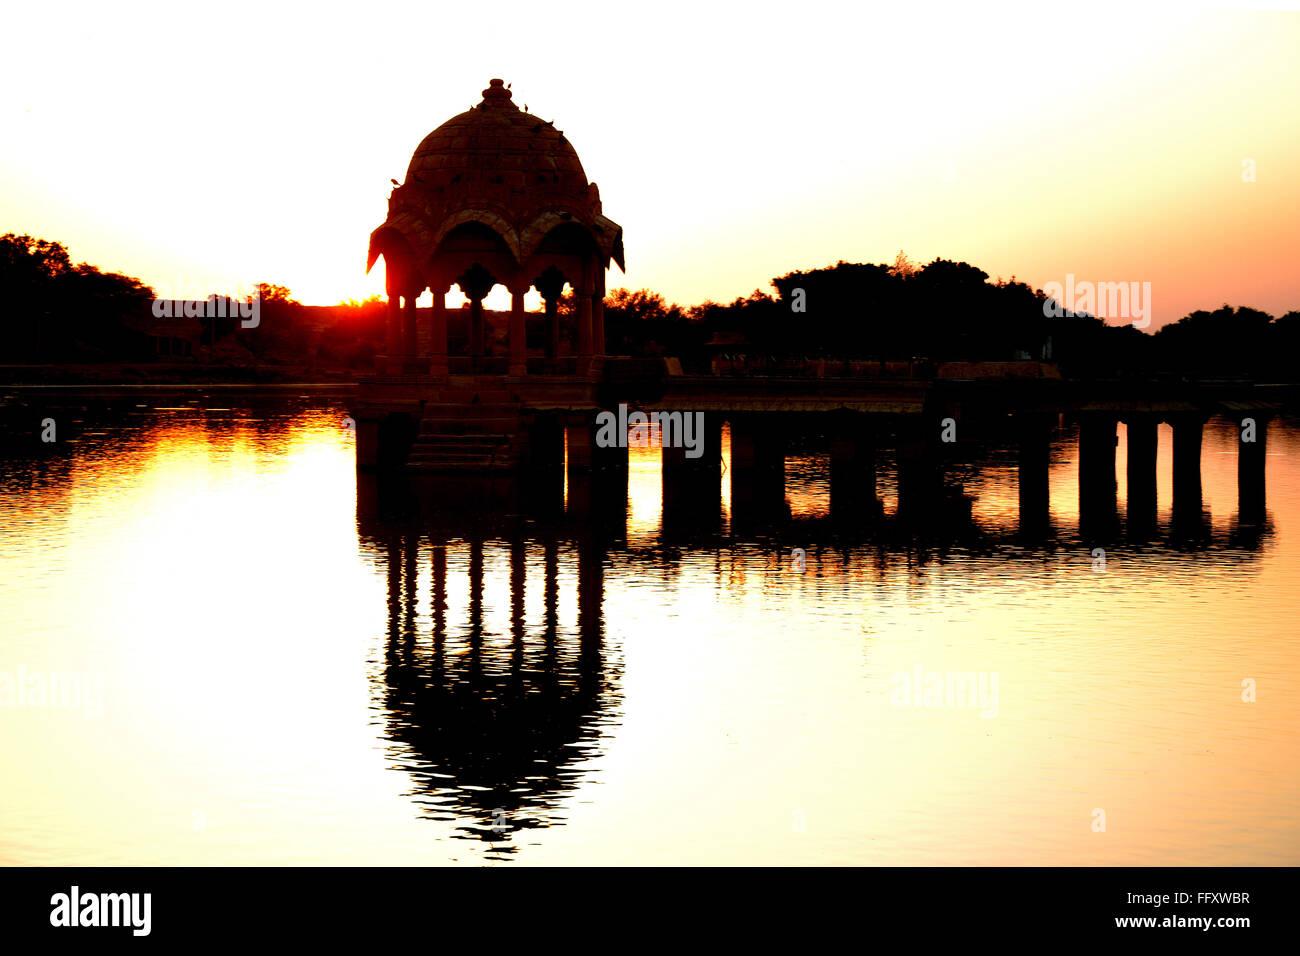 Sun rise at gadisar lake at jaisalmer - Stock Image